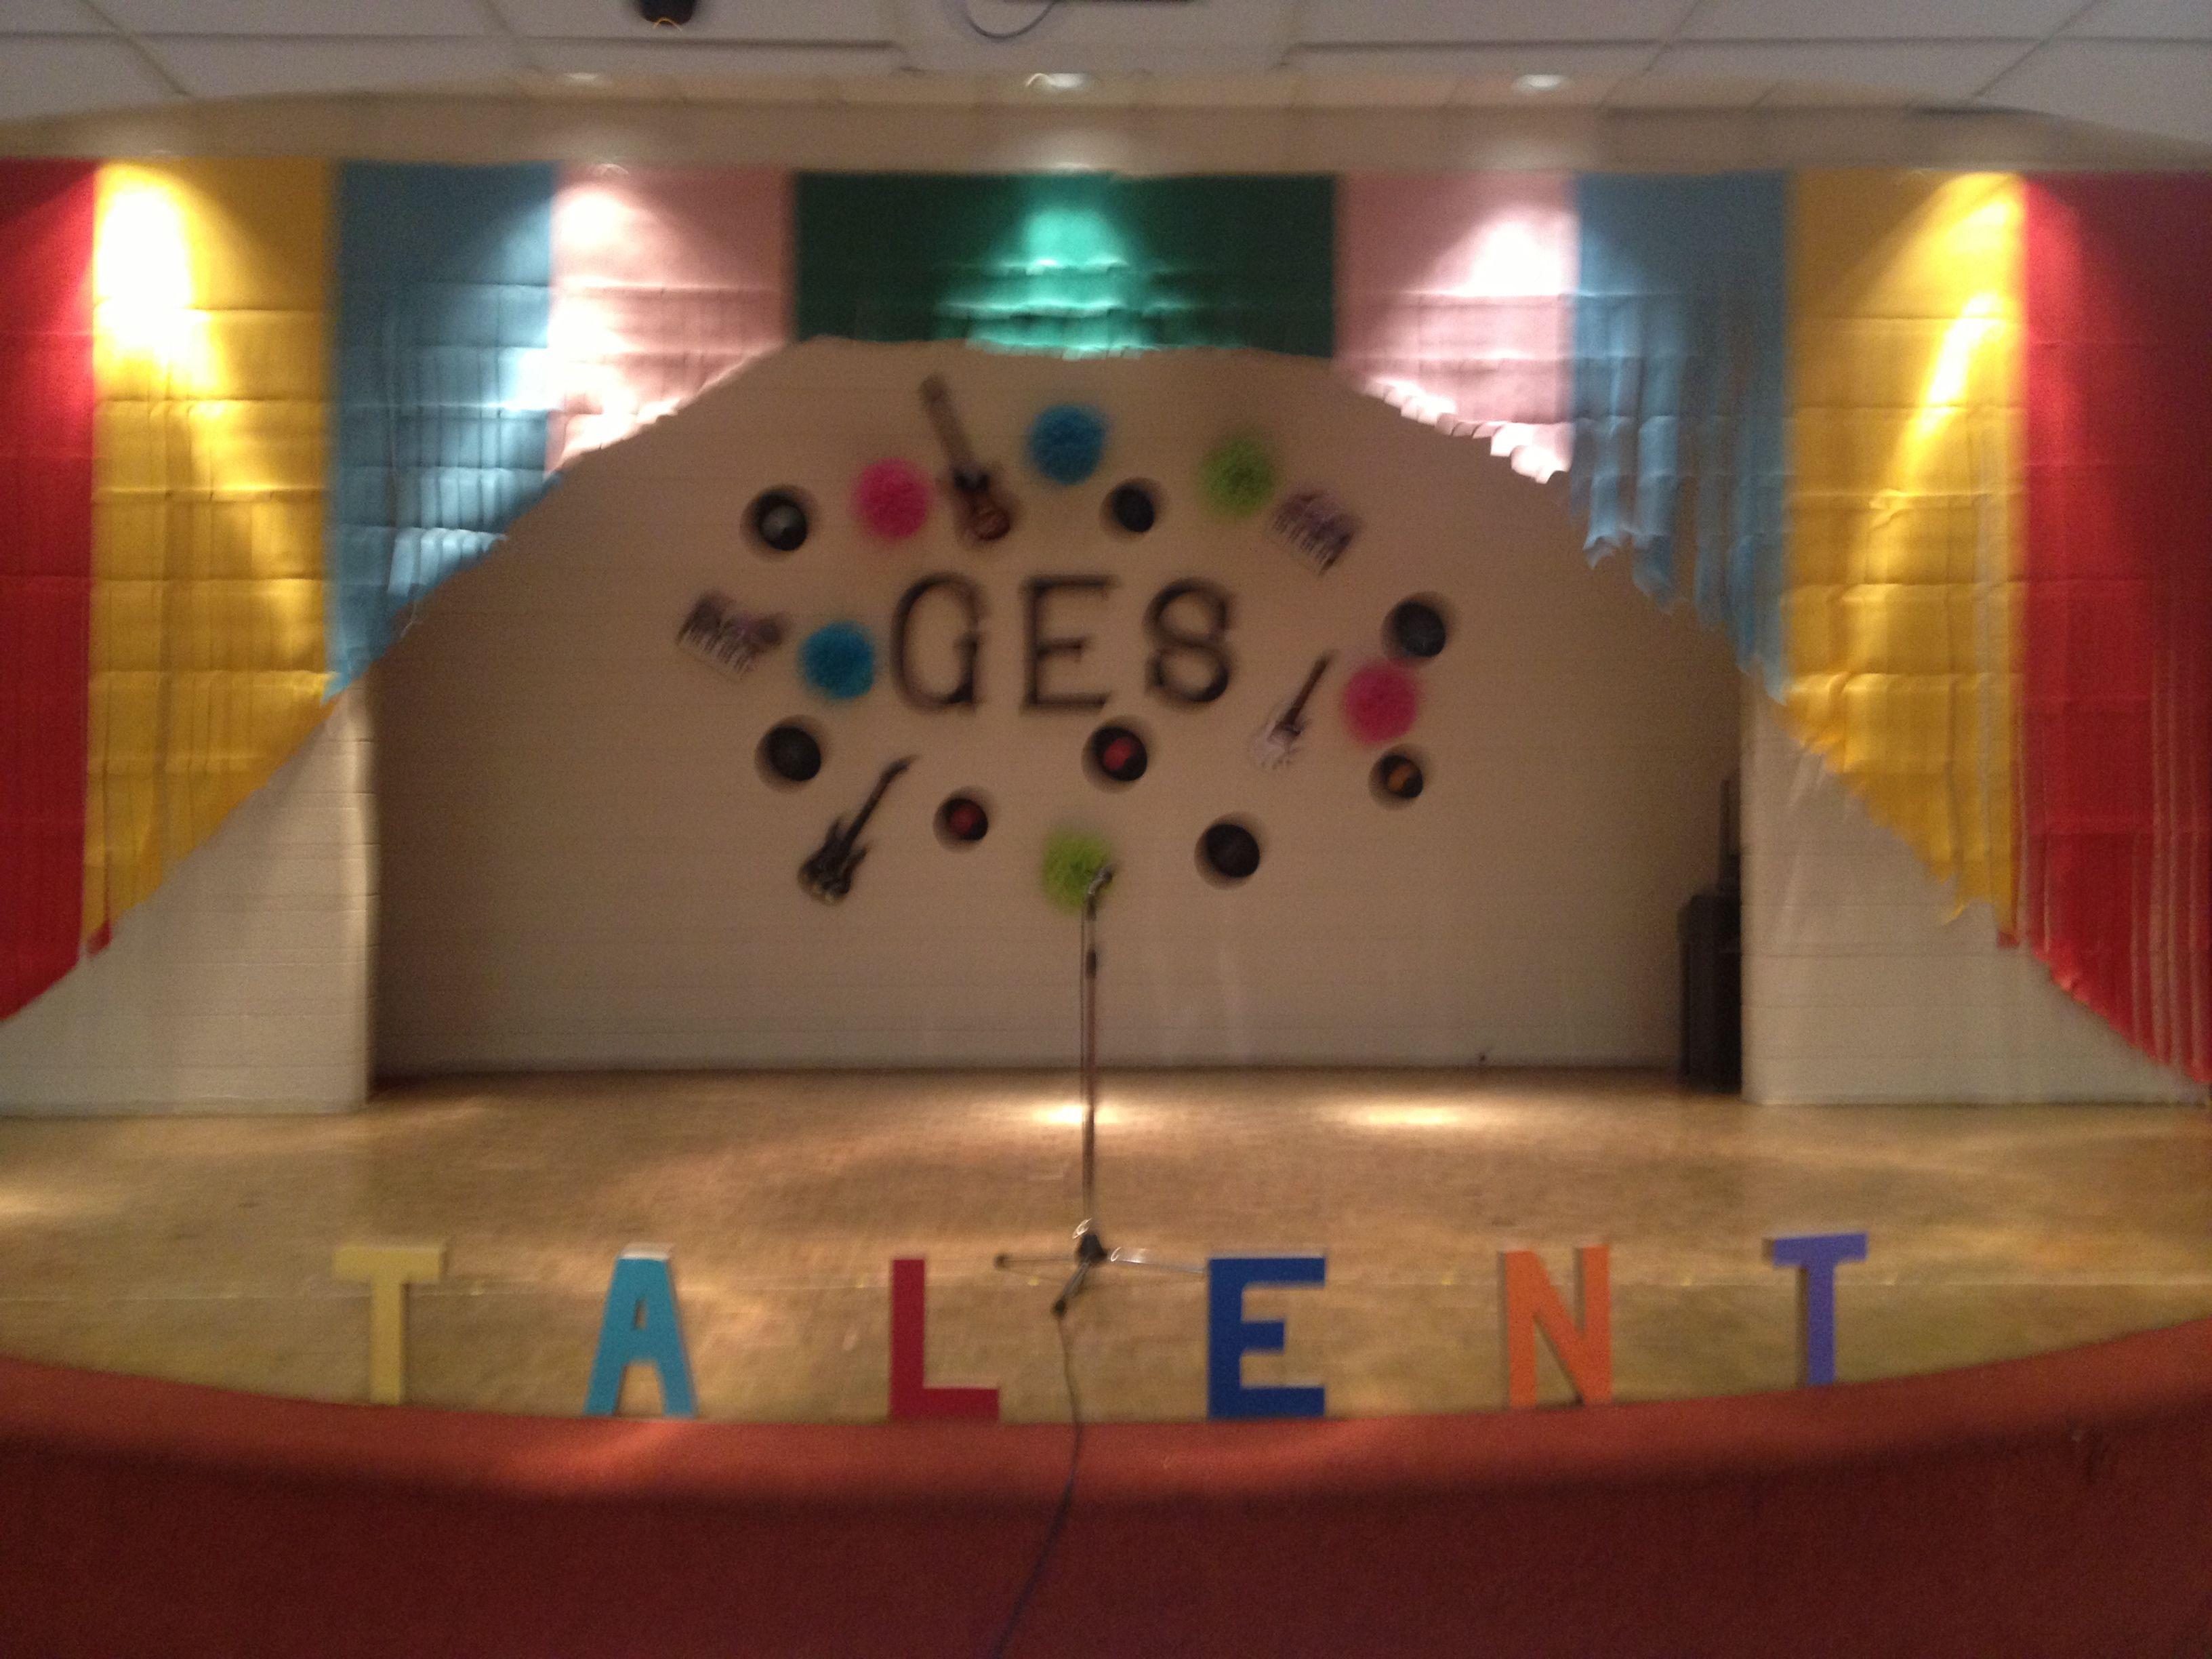 Talent Show Ready For My Classroom Talent Show Got Talent Show